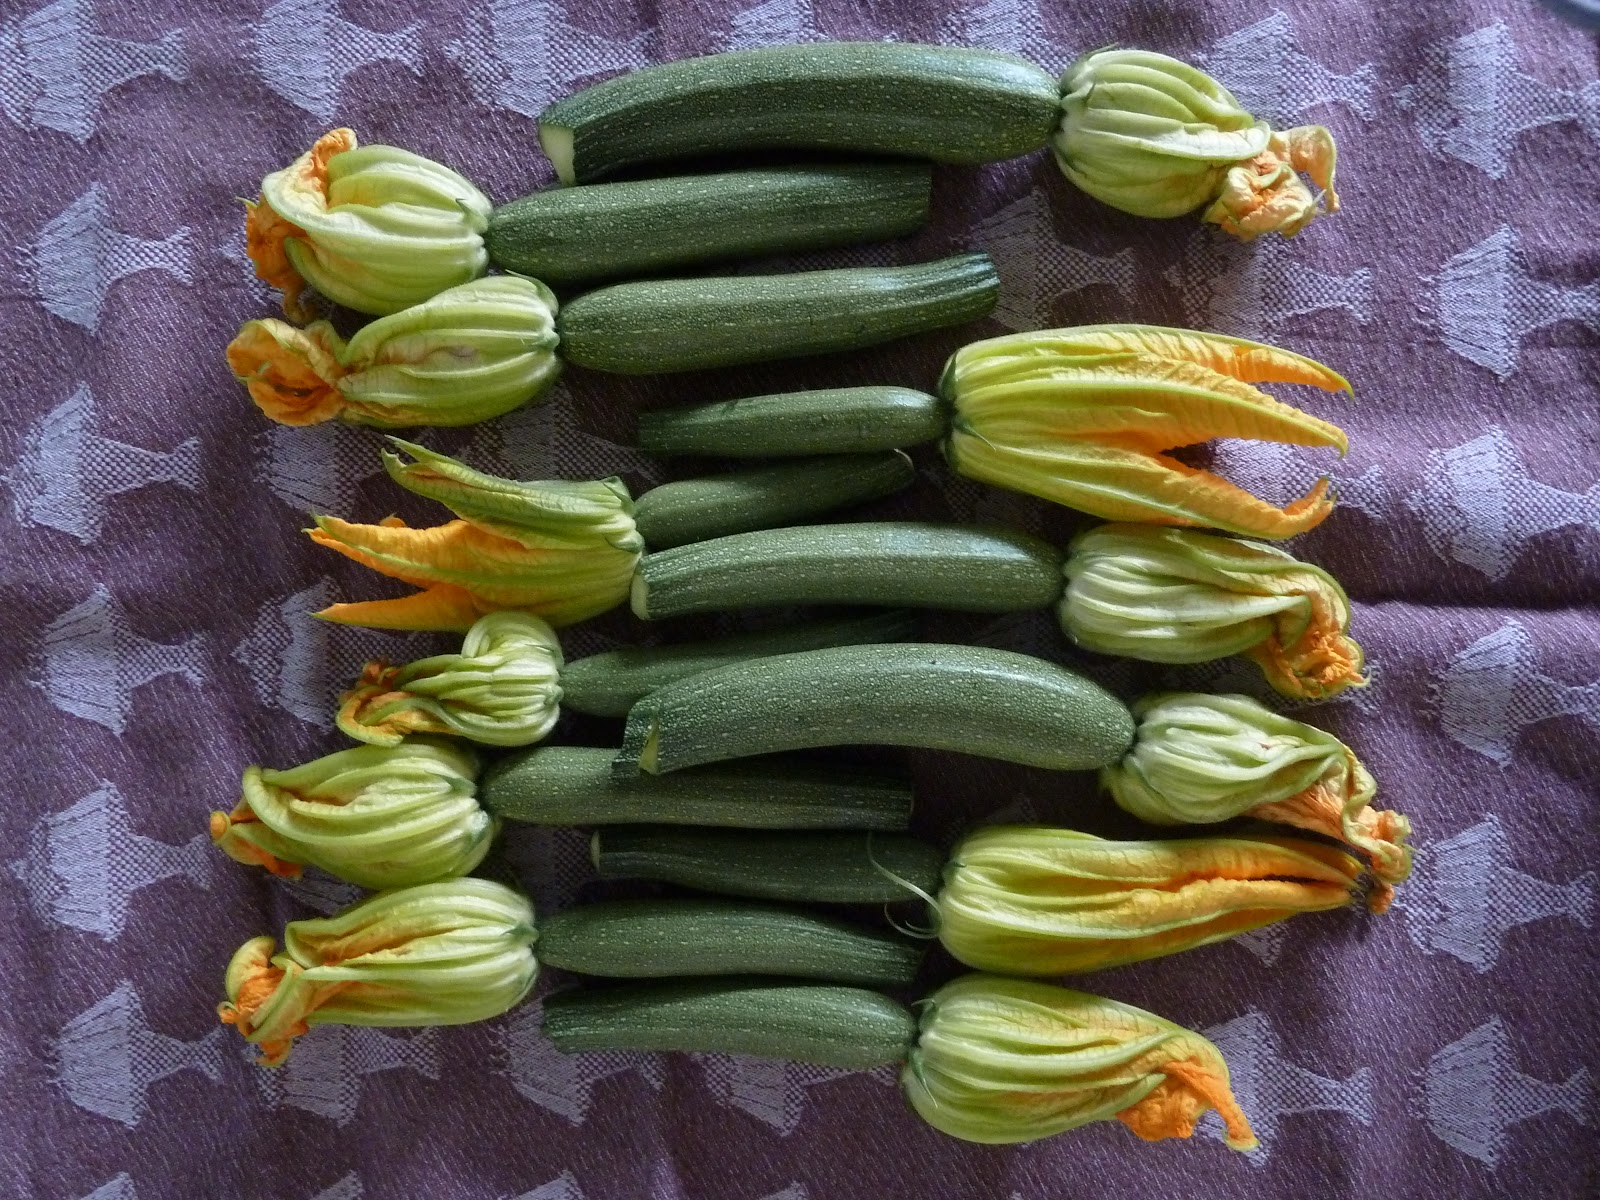 berall nirgendwo gef llte zucchini bl ten auf tomatenso e ein absolutes traumgericht. Black Bedroom Furniture Sets. Home Design Ideas